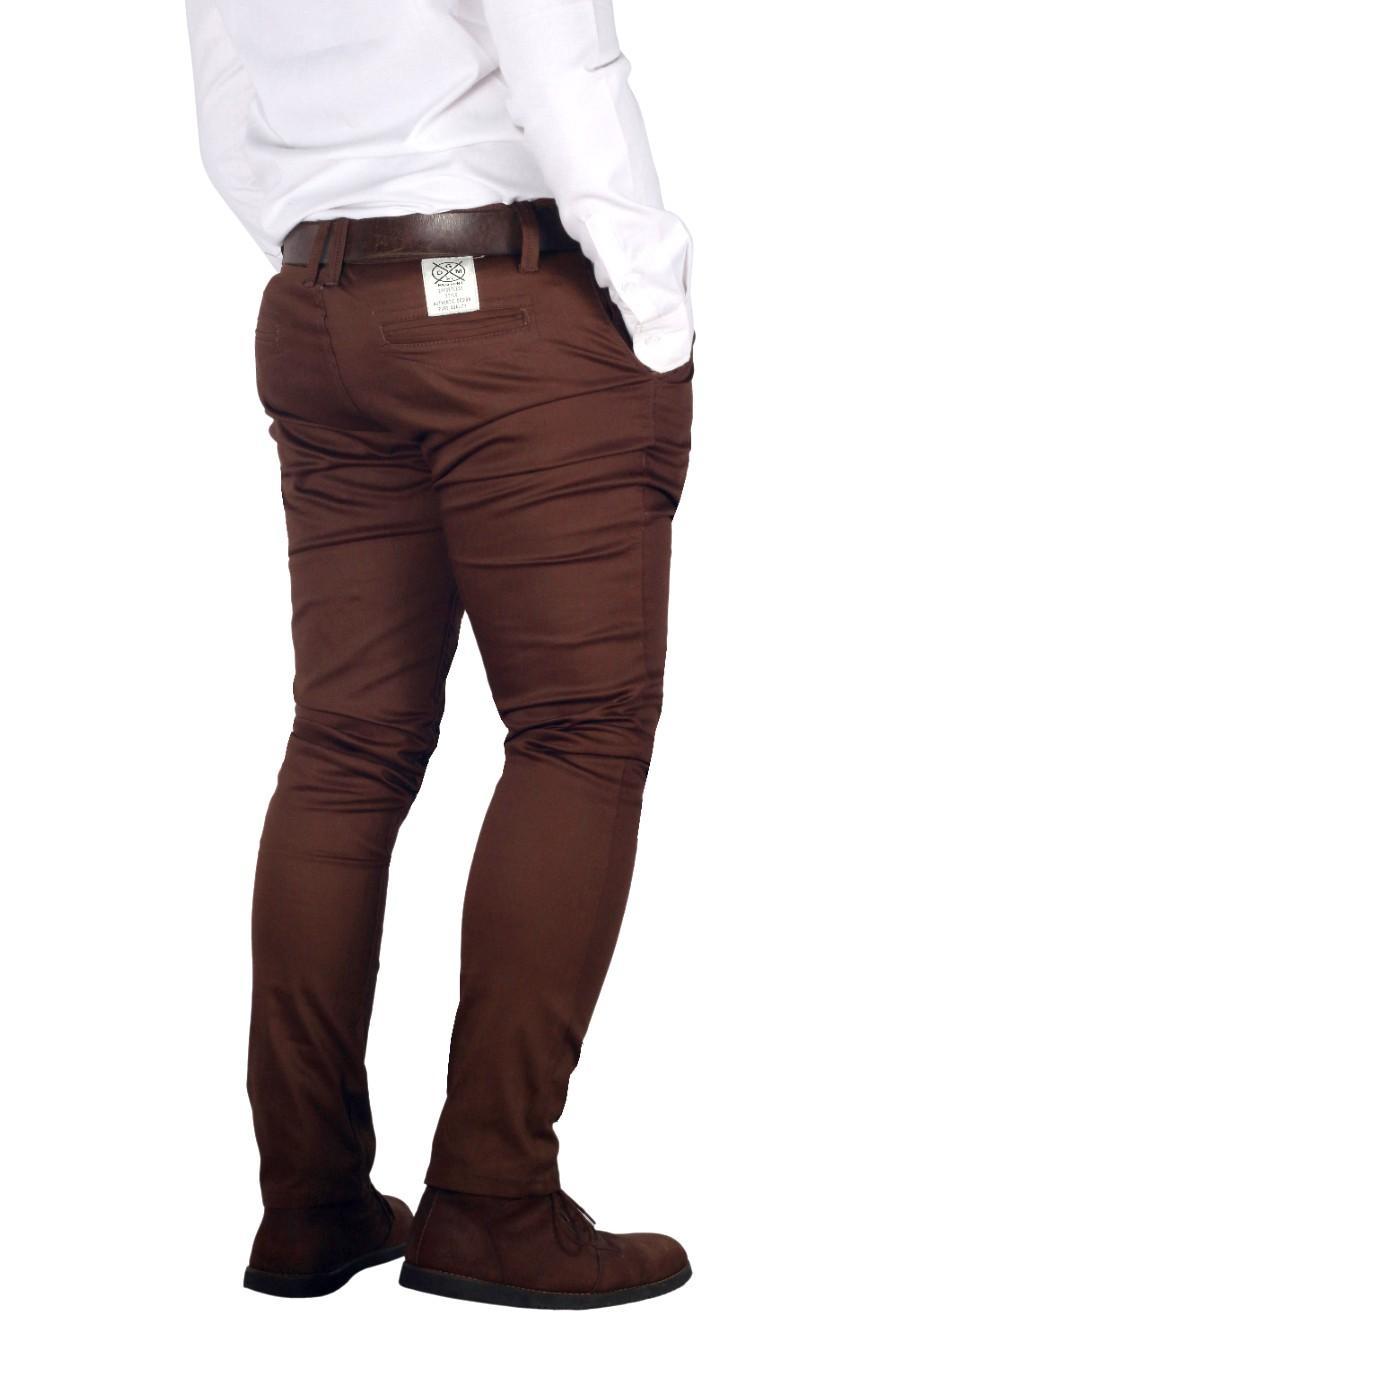 Dgm_Fashion1 Celana Distro CINO Coklat IMPORT/ Celana Skinny/Celana Pants/Celana Santai/Celana Casual/Celana Motif/Celana Polos/Celana Pria/Celana Cino/Celana Pantai/Celana Denim/Celana Jeans RX 5420